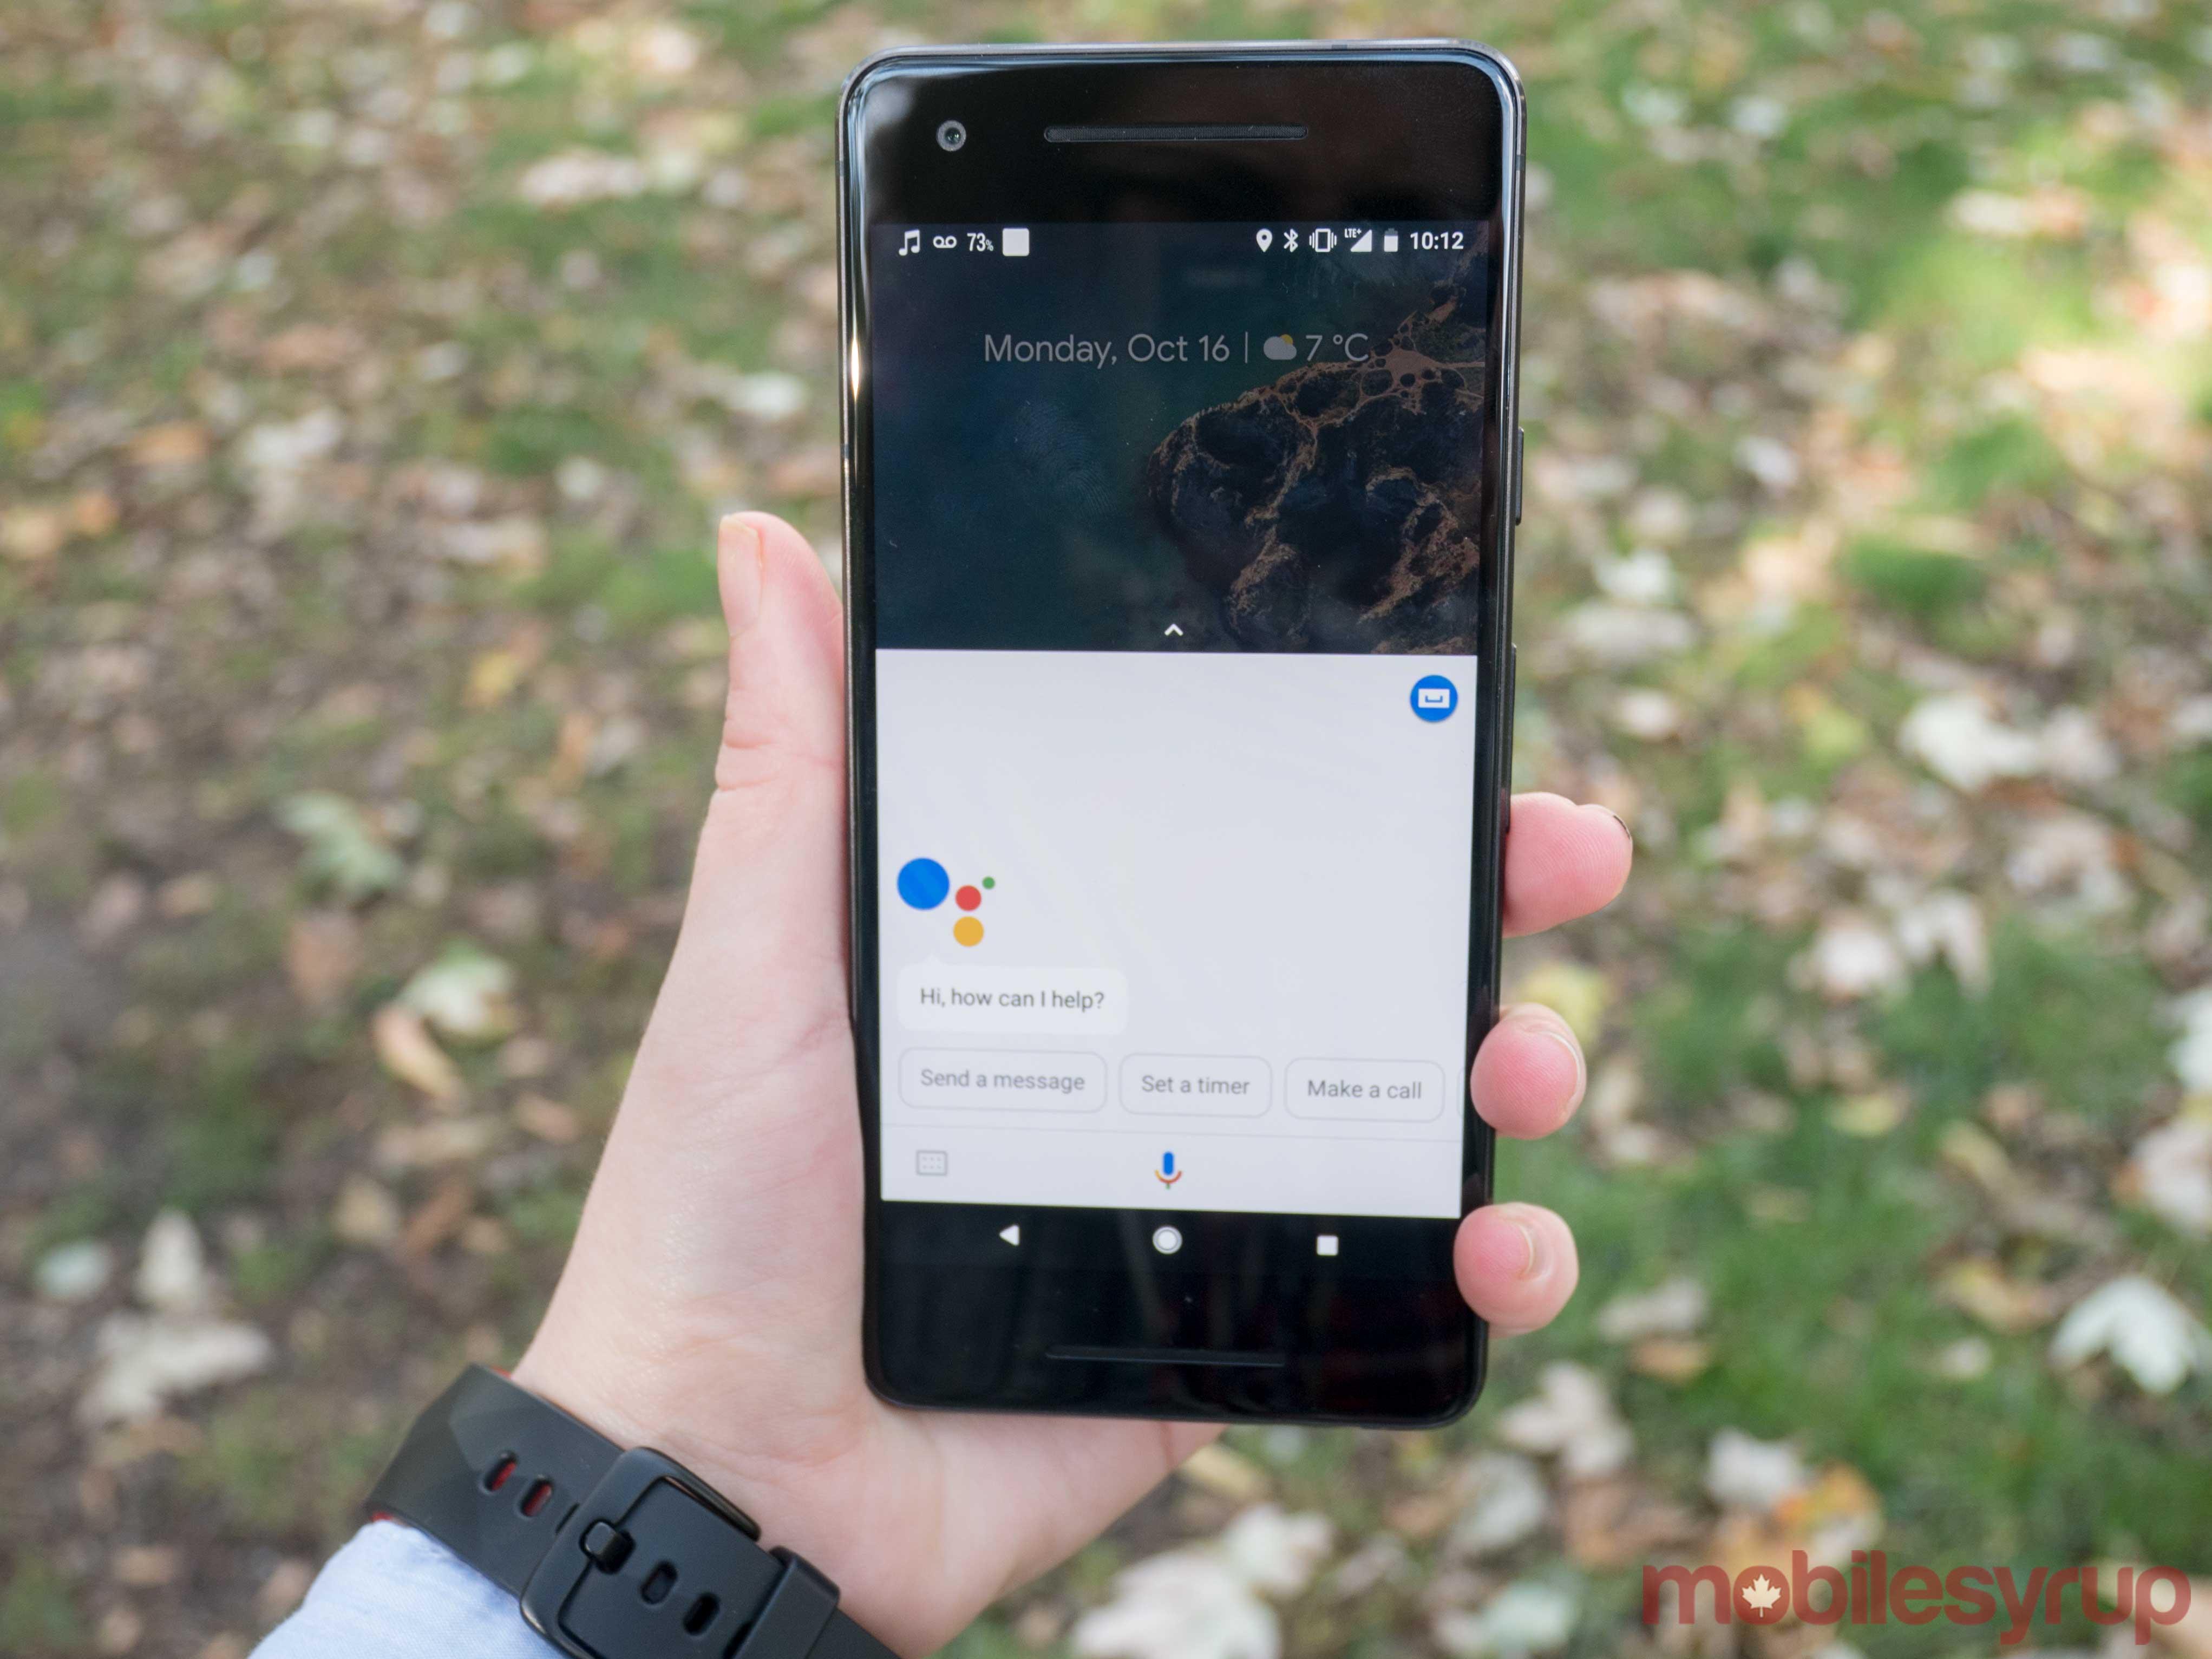 Google Pixel 2 Google Assistant